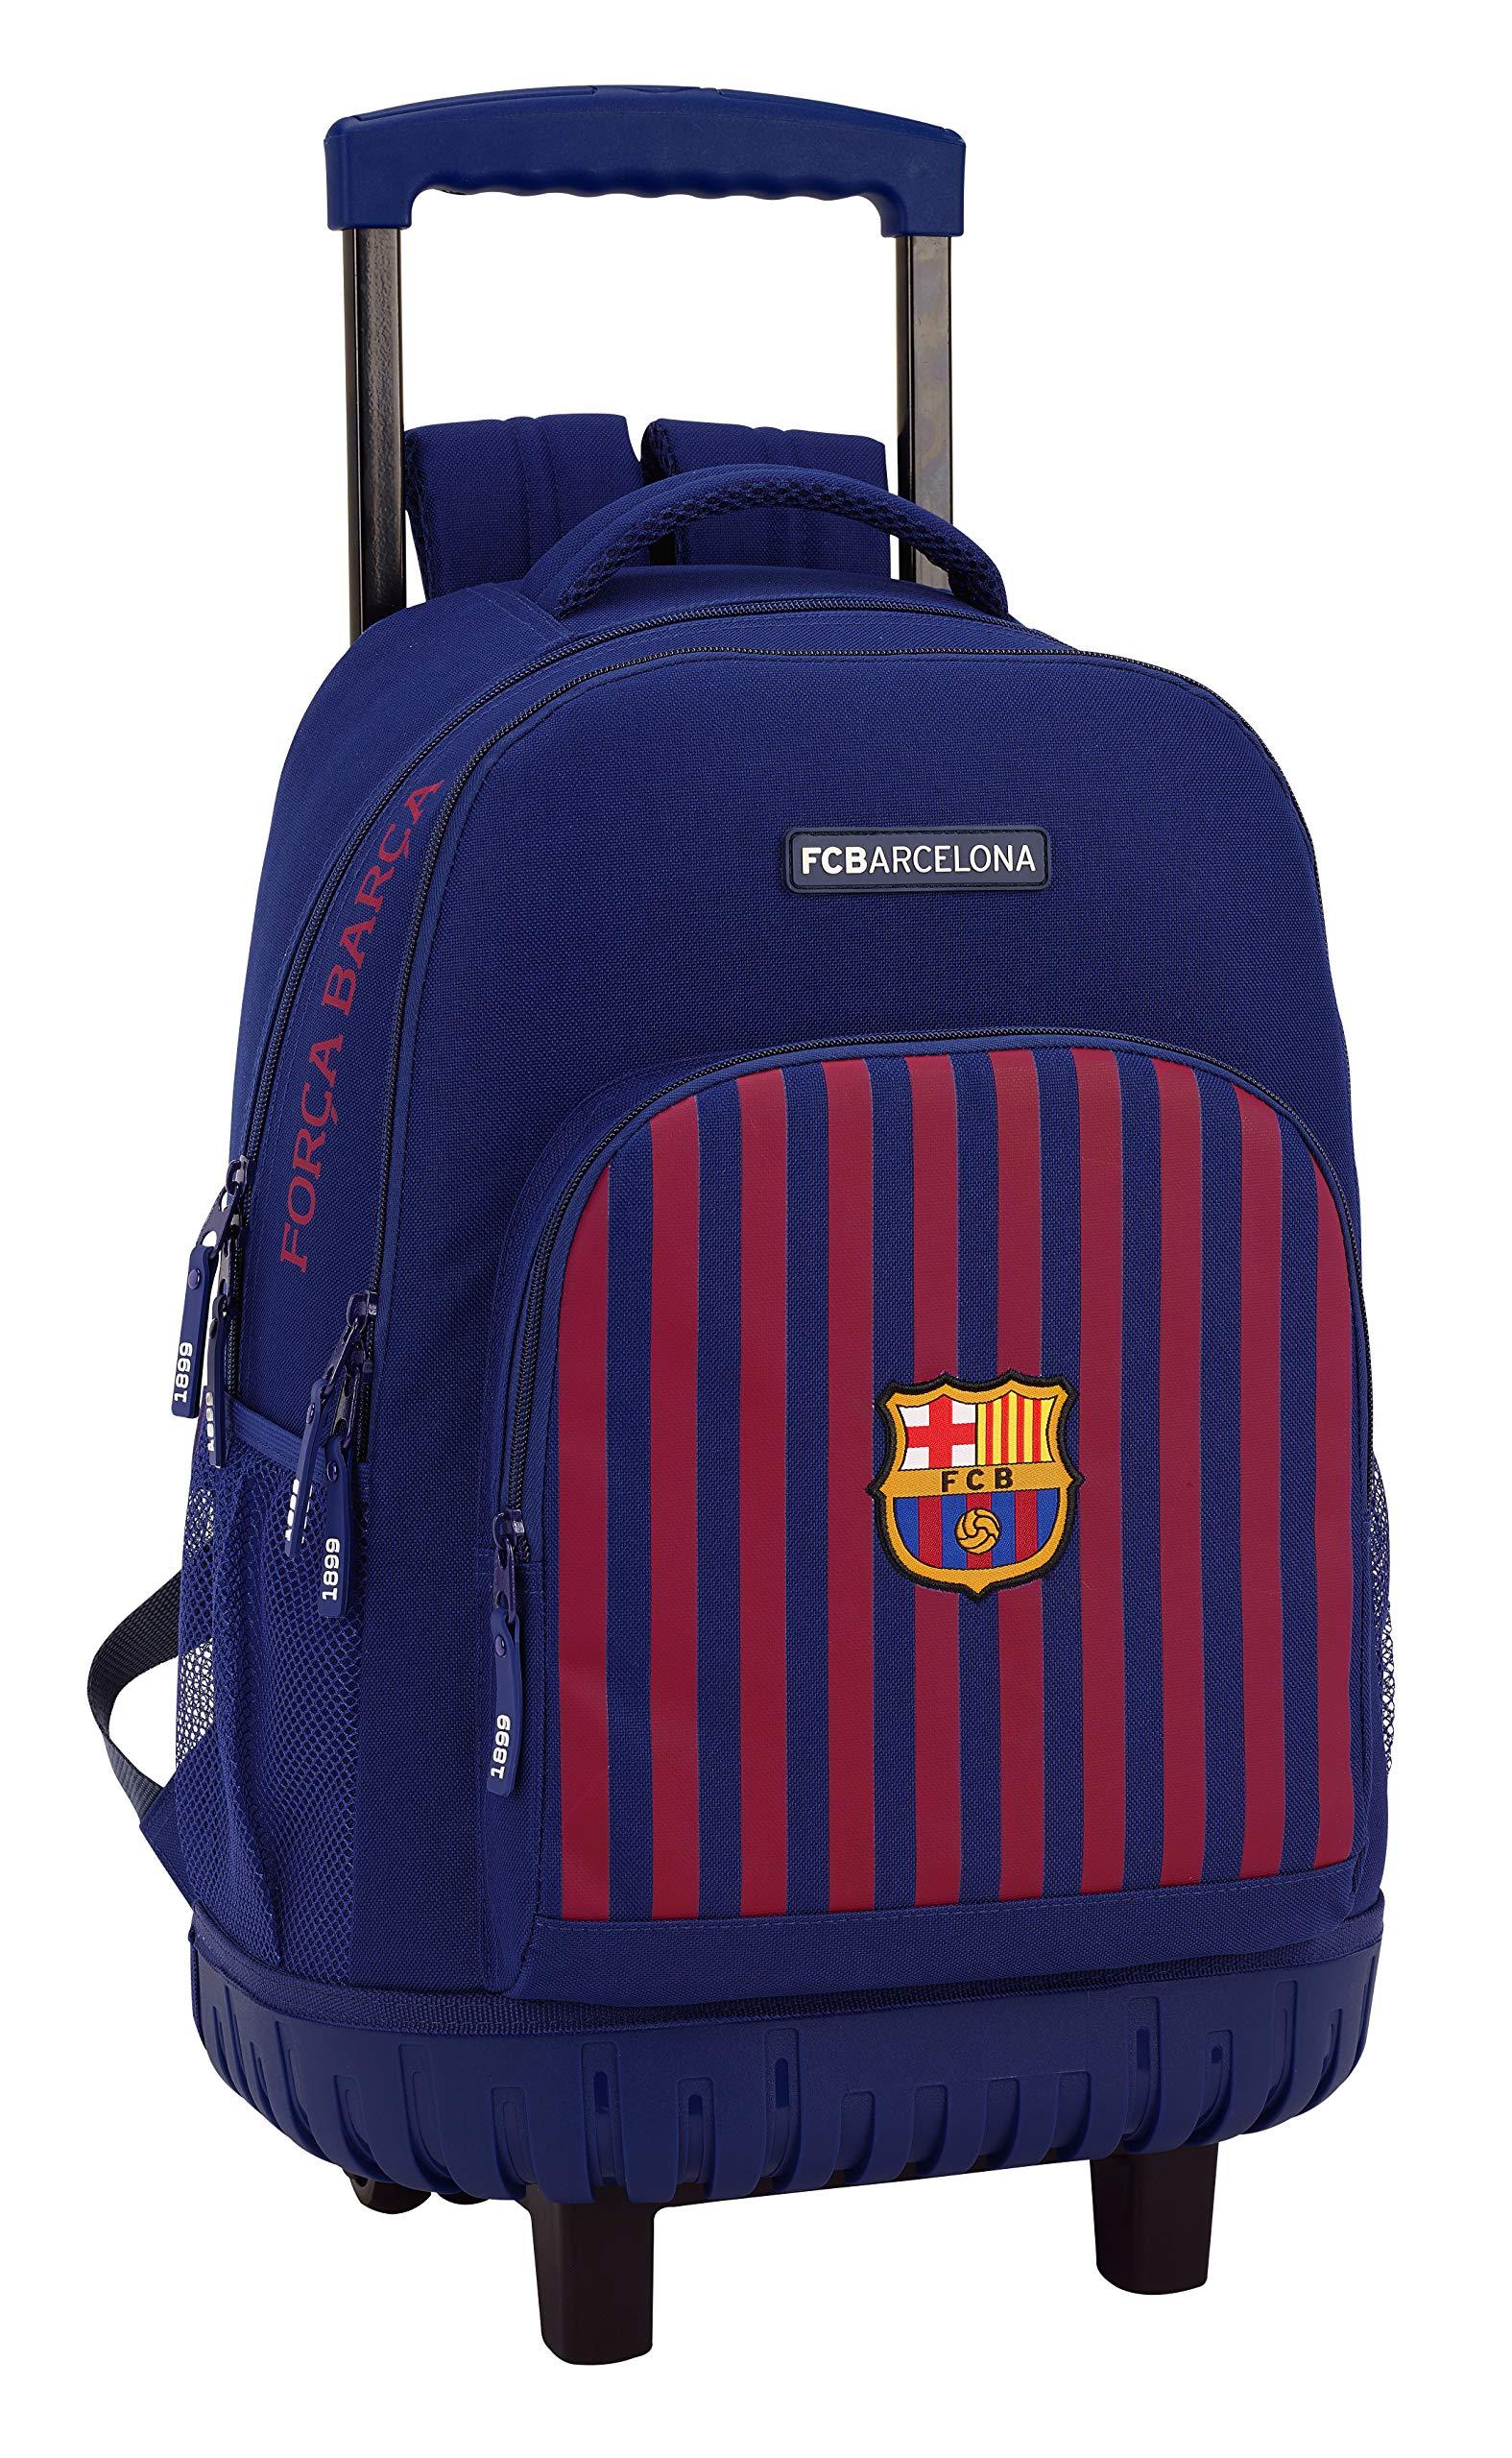 FC Barcelona 611829818 2018 Mochila Escolar ae8ccc49864